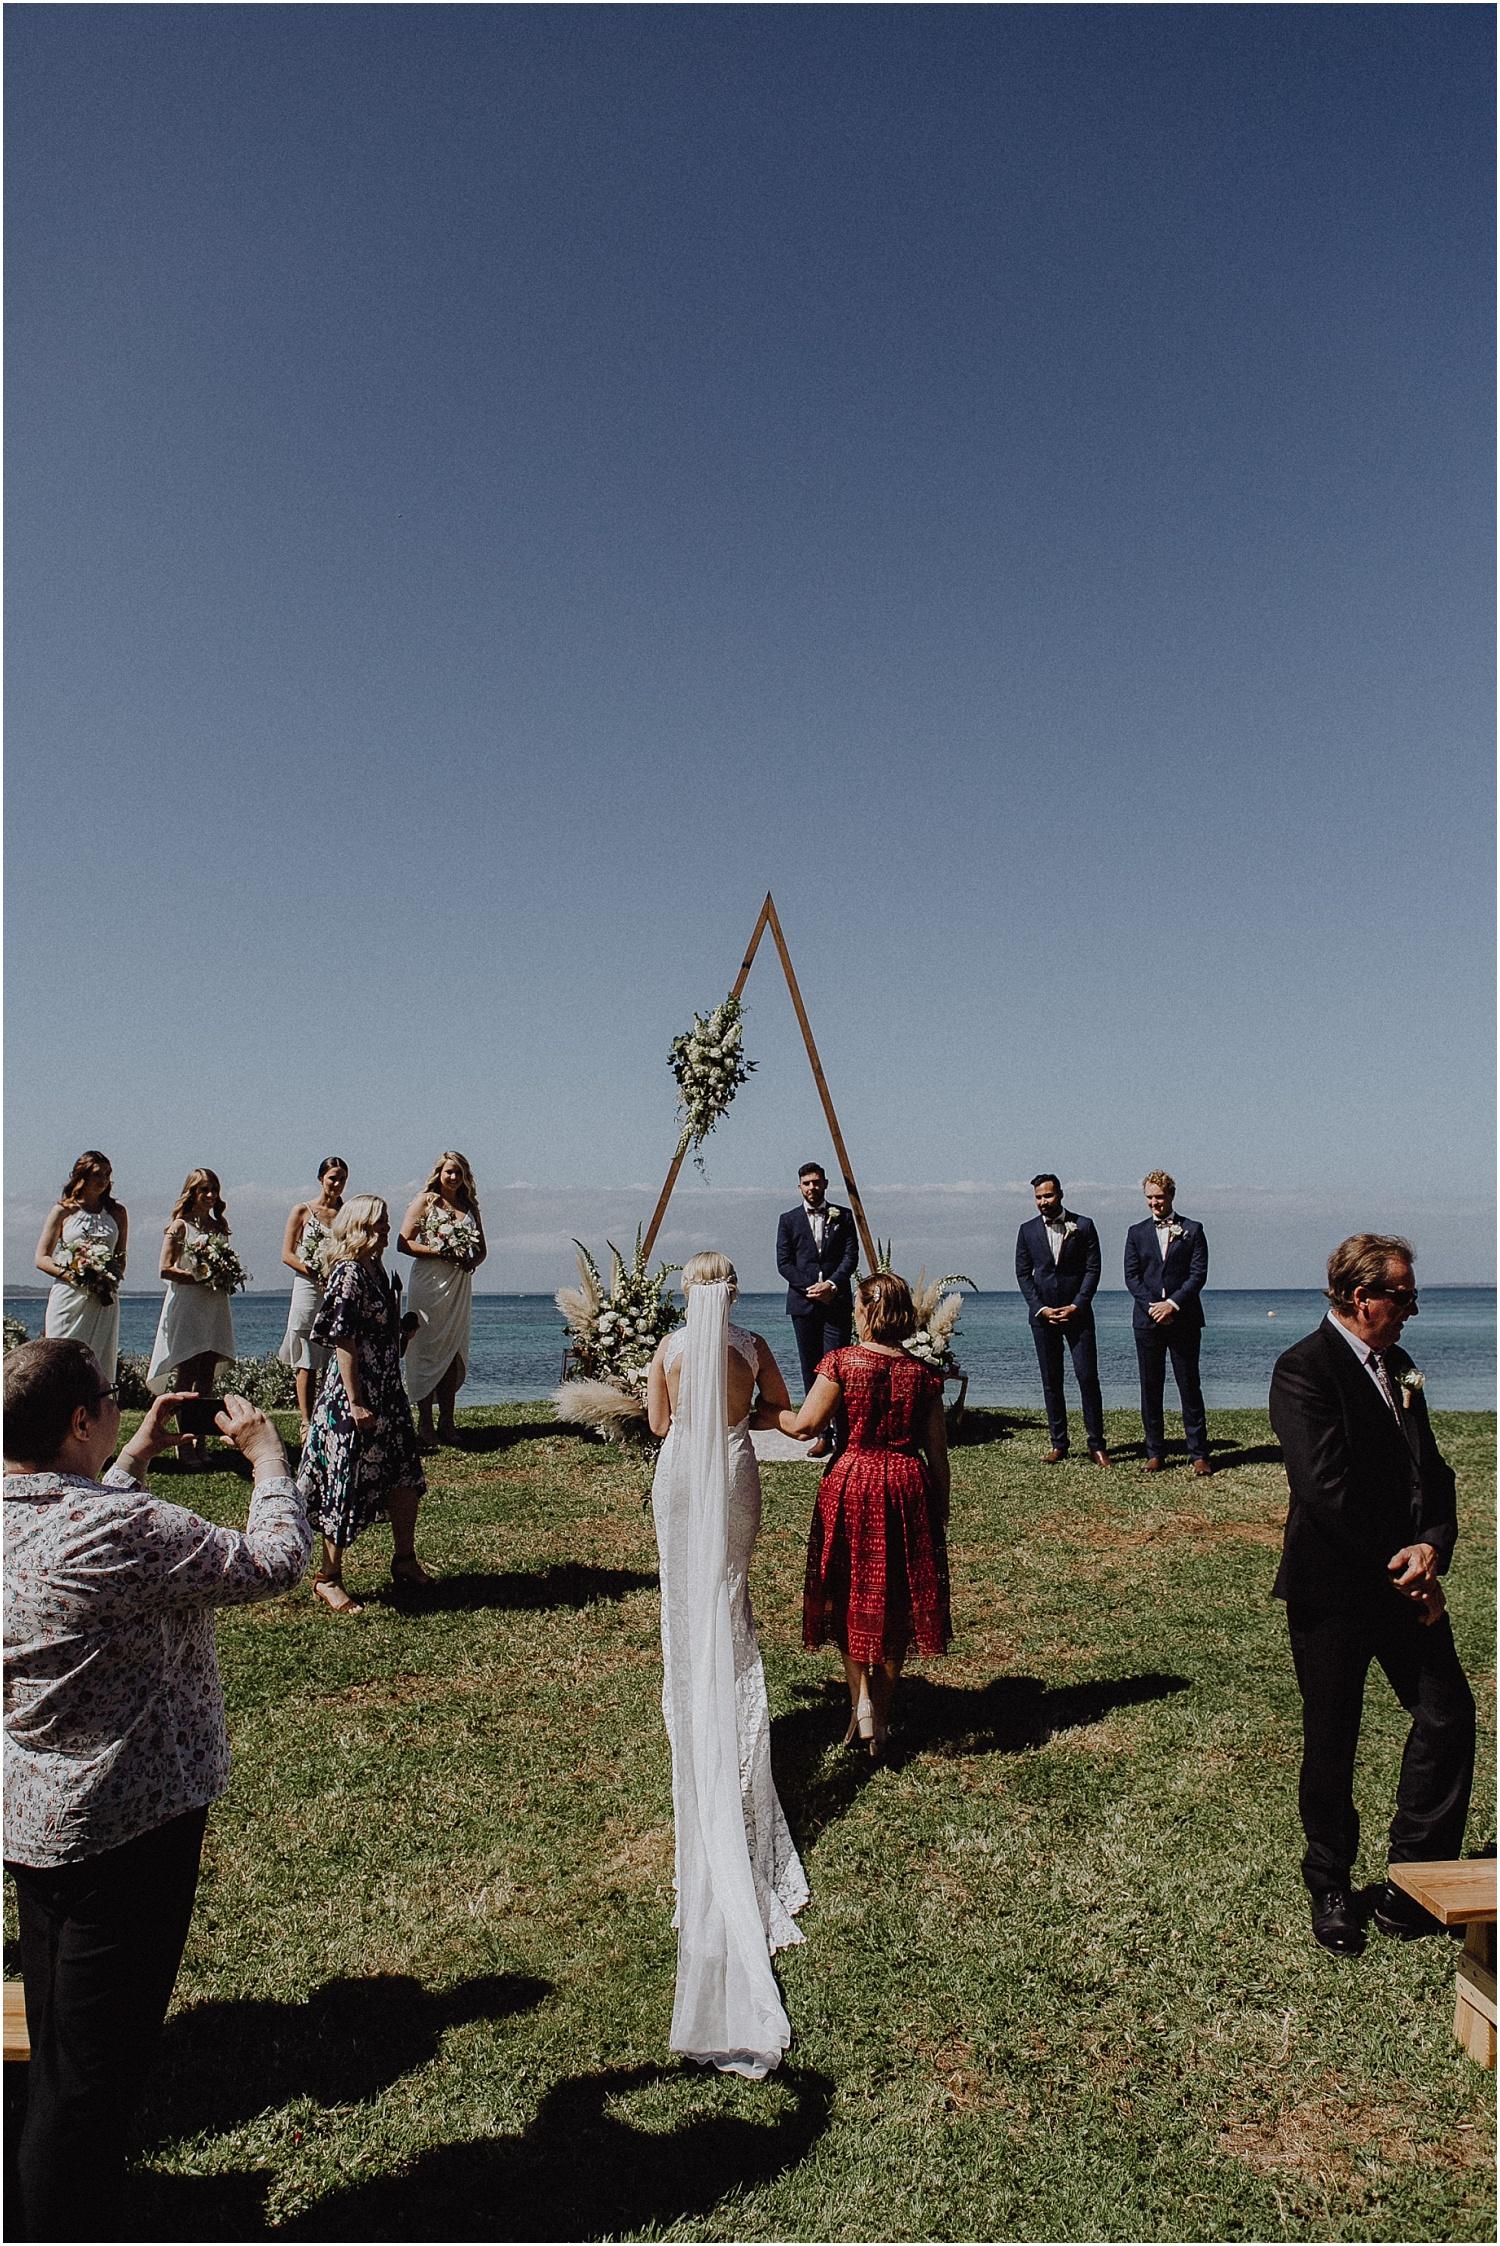 Nicolle and Damien's tipi wedding at the Flinders Yacht Club on the Mornington Peninsula._0067.jpg